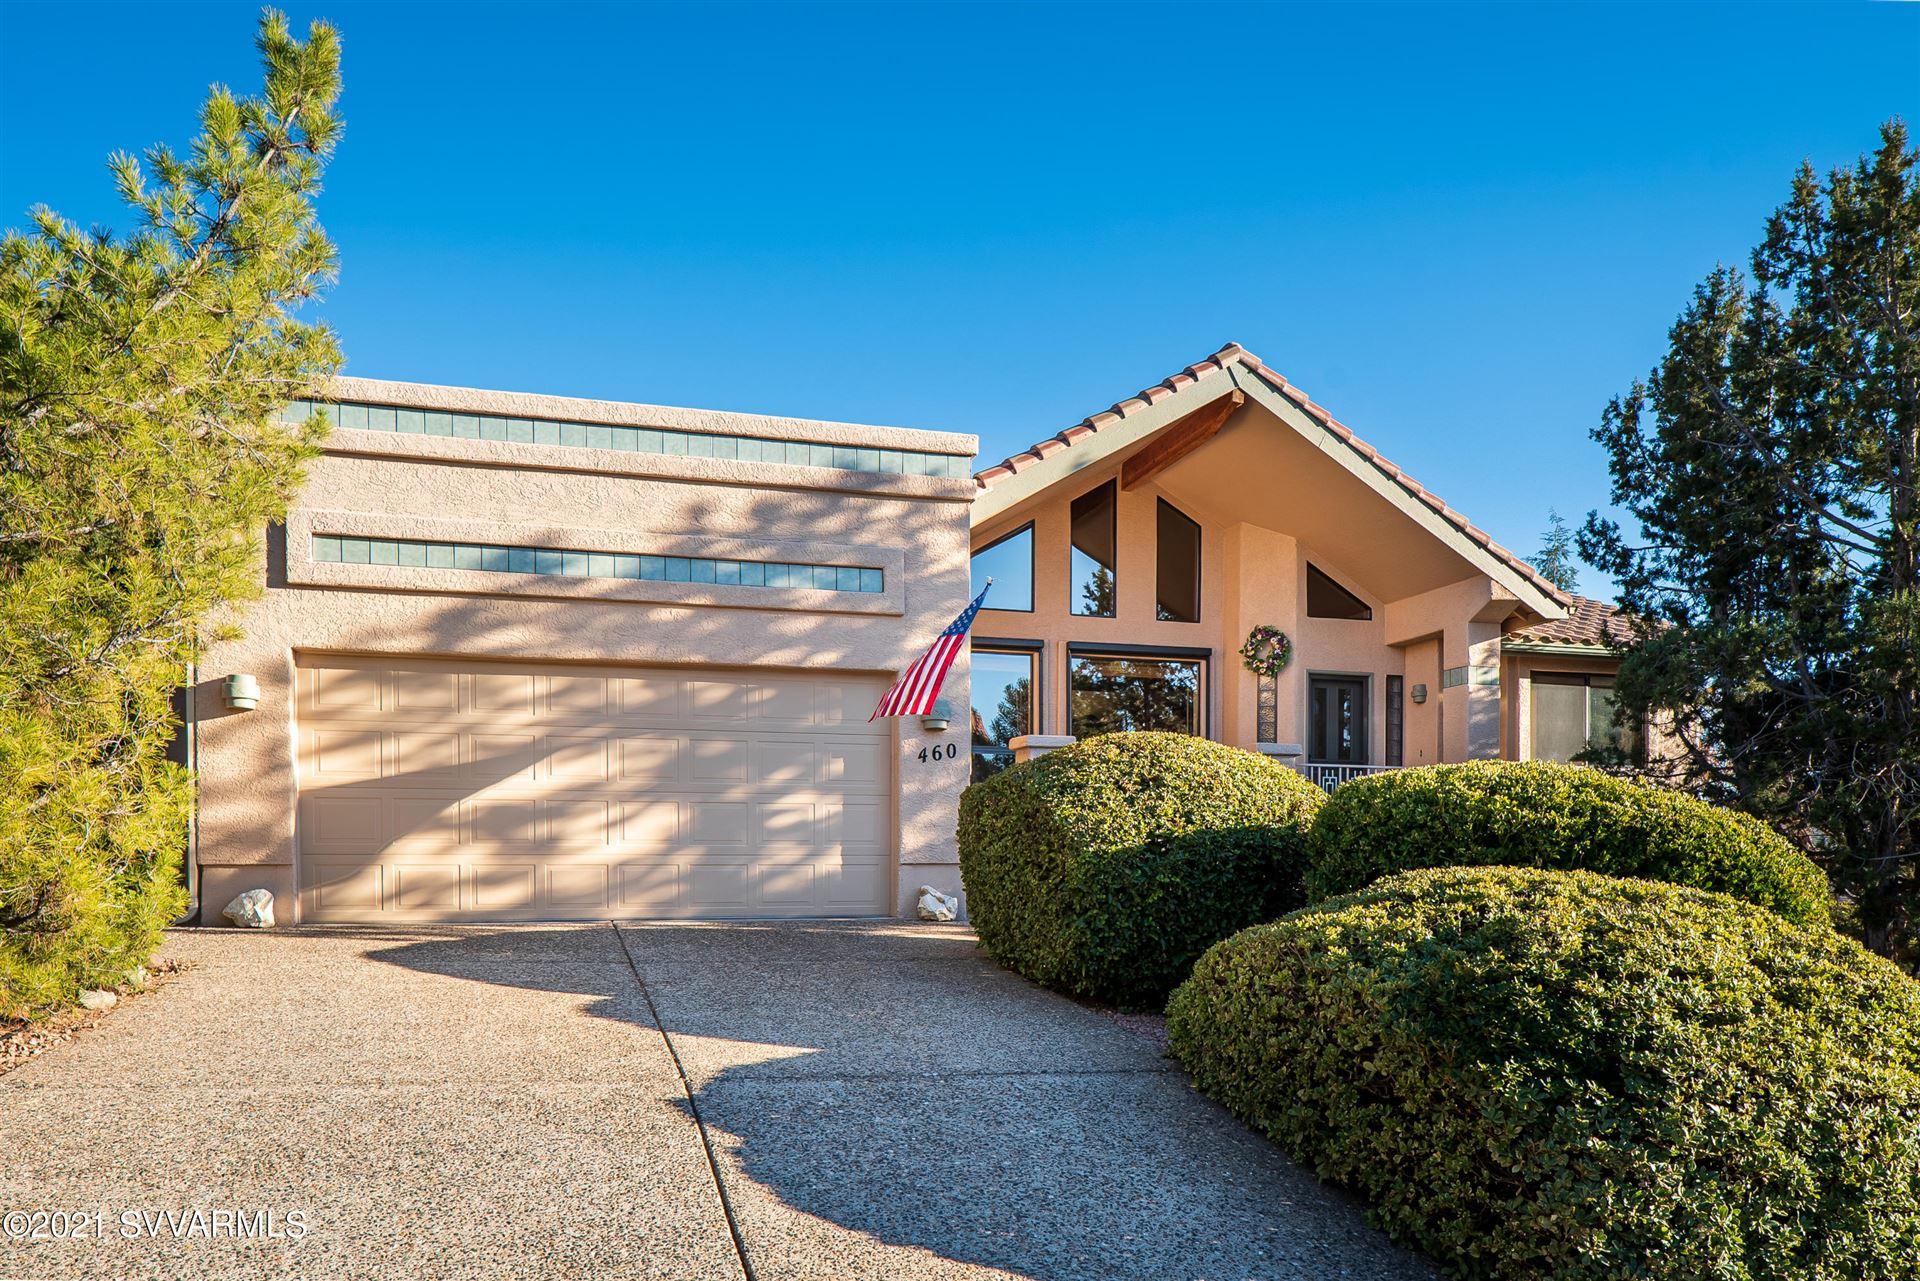 Photo of 460 Concho Drive, Sedona, AZ 86351 (MLS # 526062)